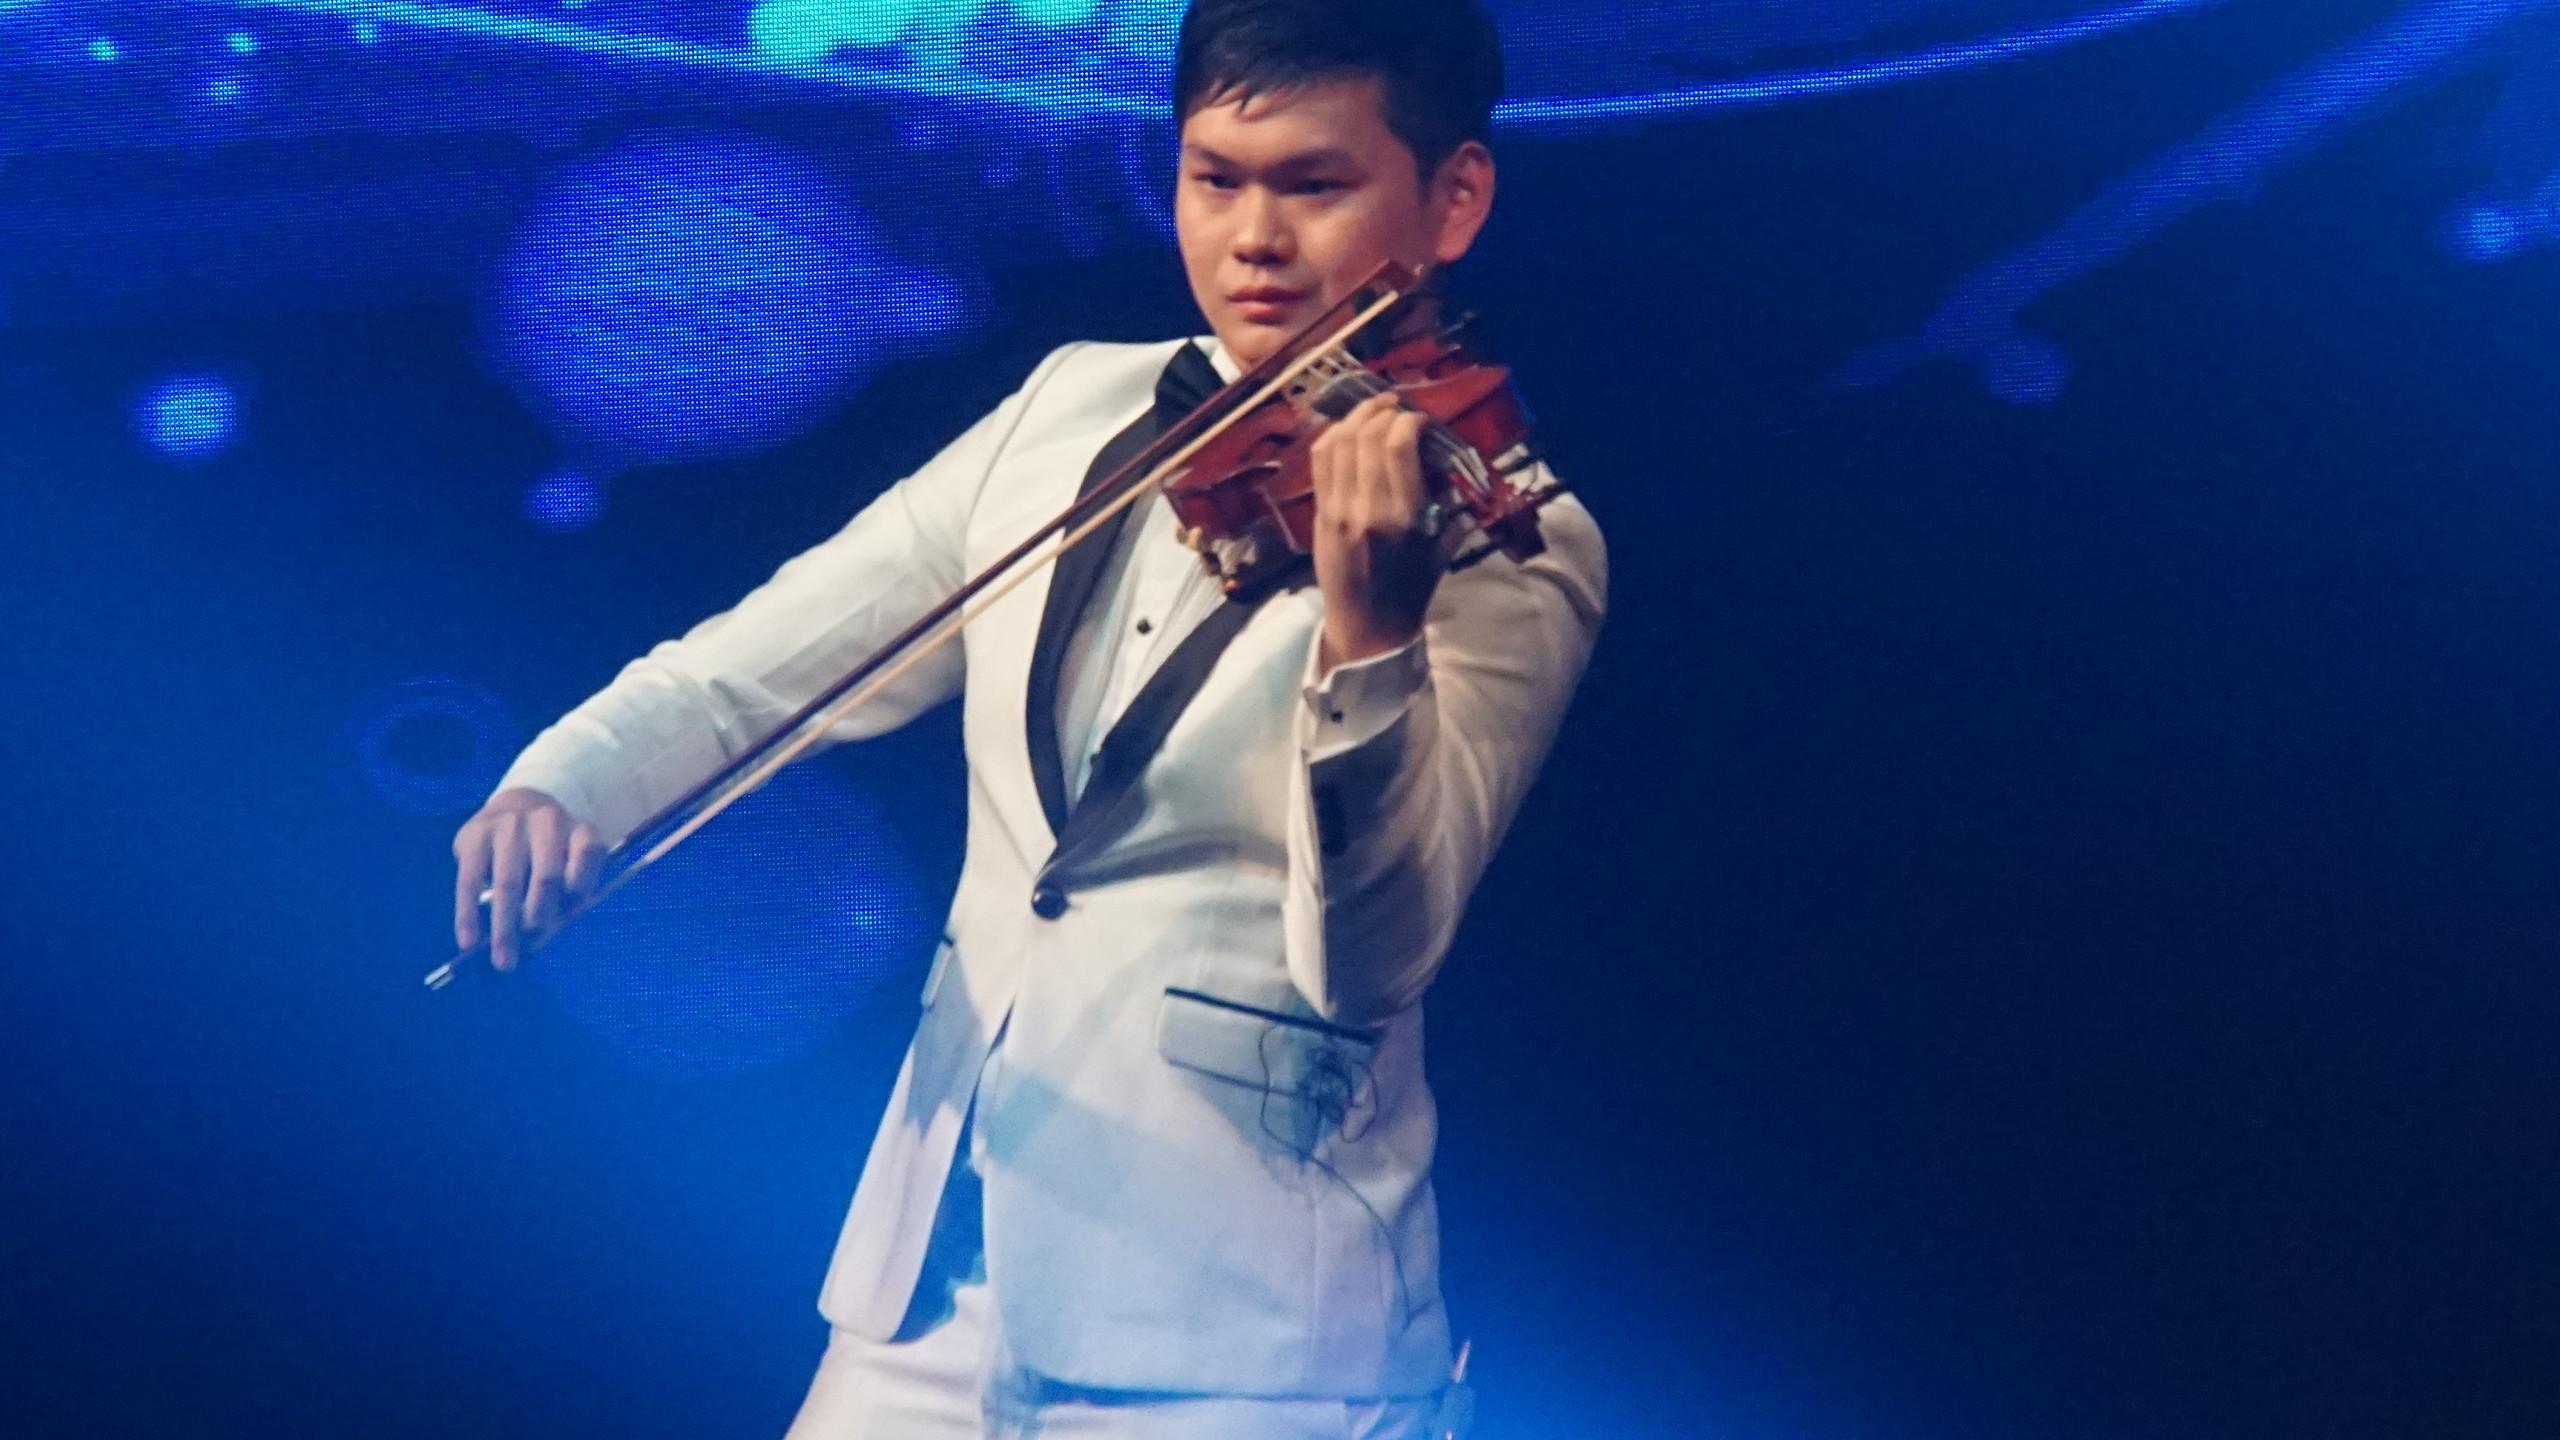 Violinist Julian Lee